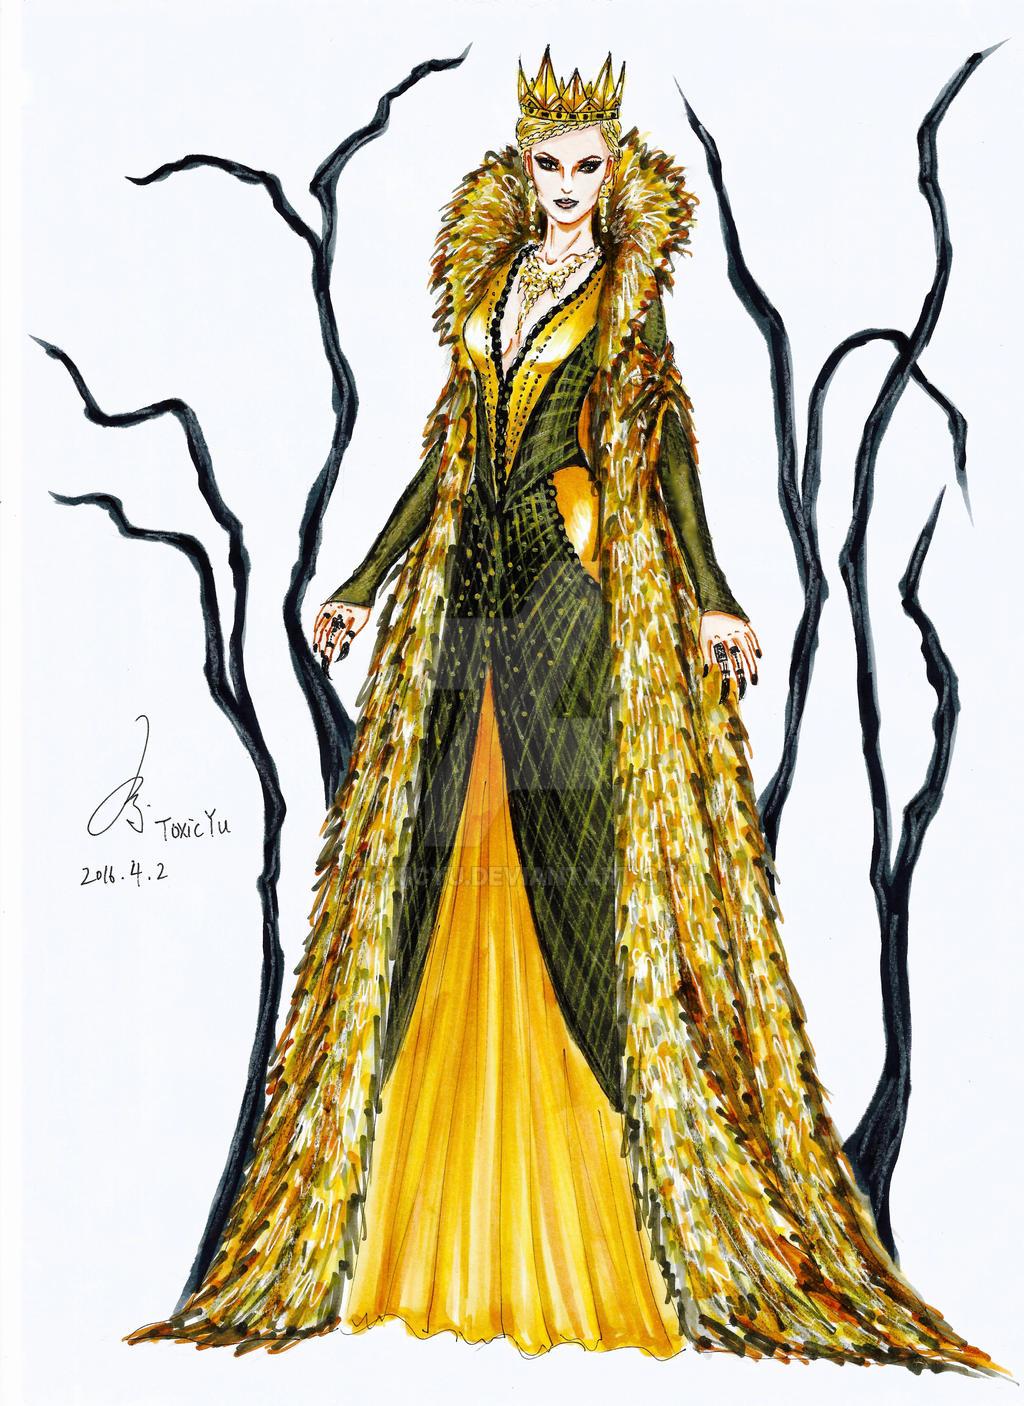 2017 fashion prints - The Evil Queen Ravenna By Toxicyu On Deviantart